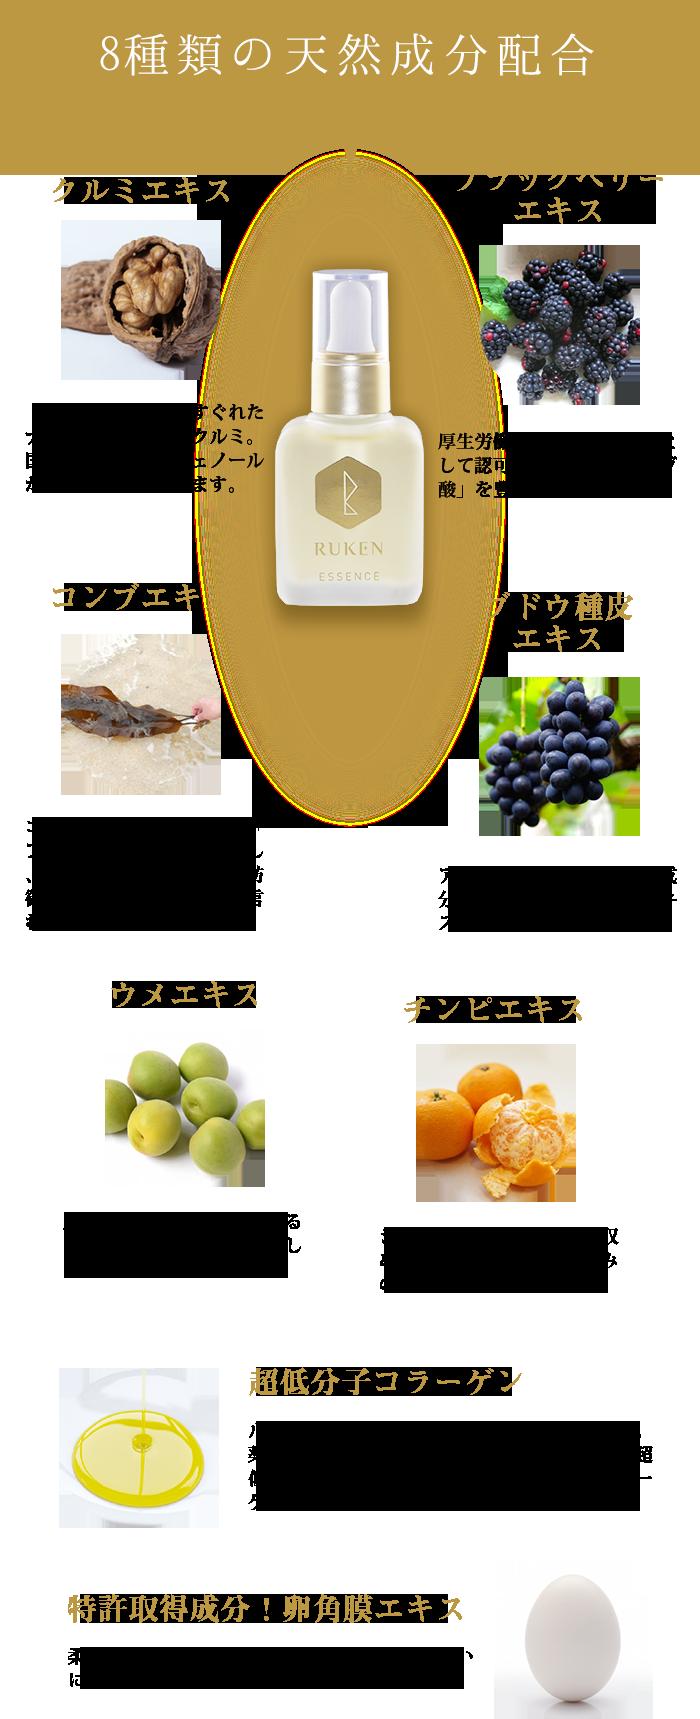 8種類の天然成分配合